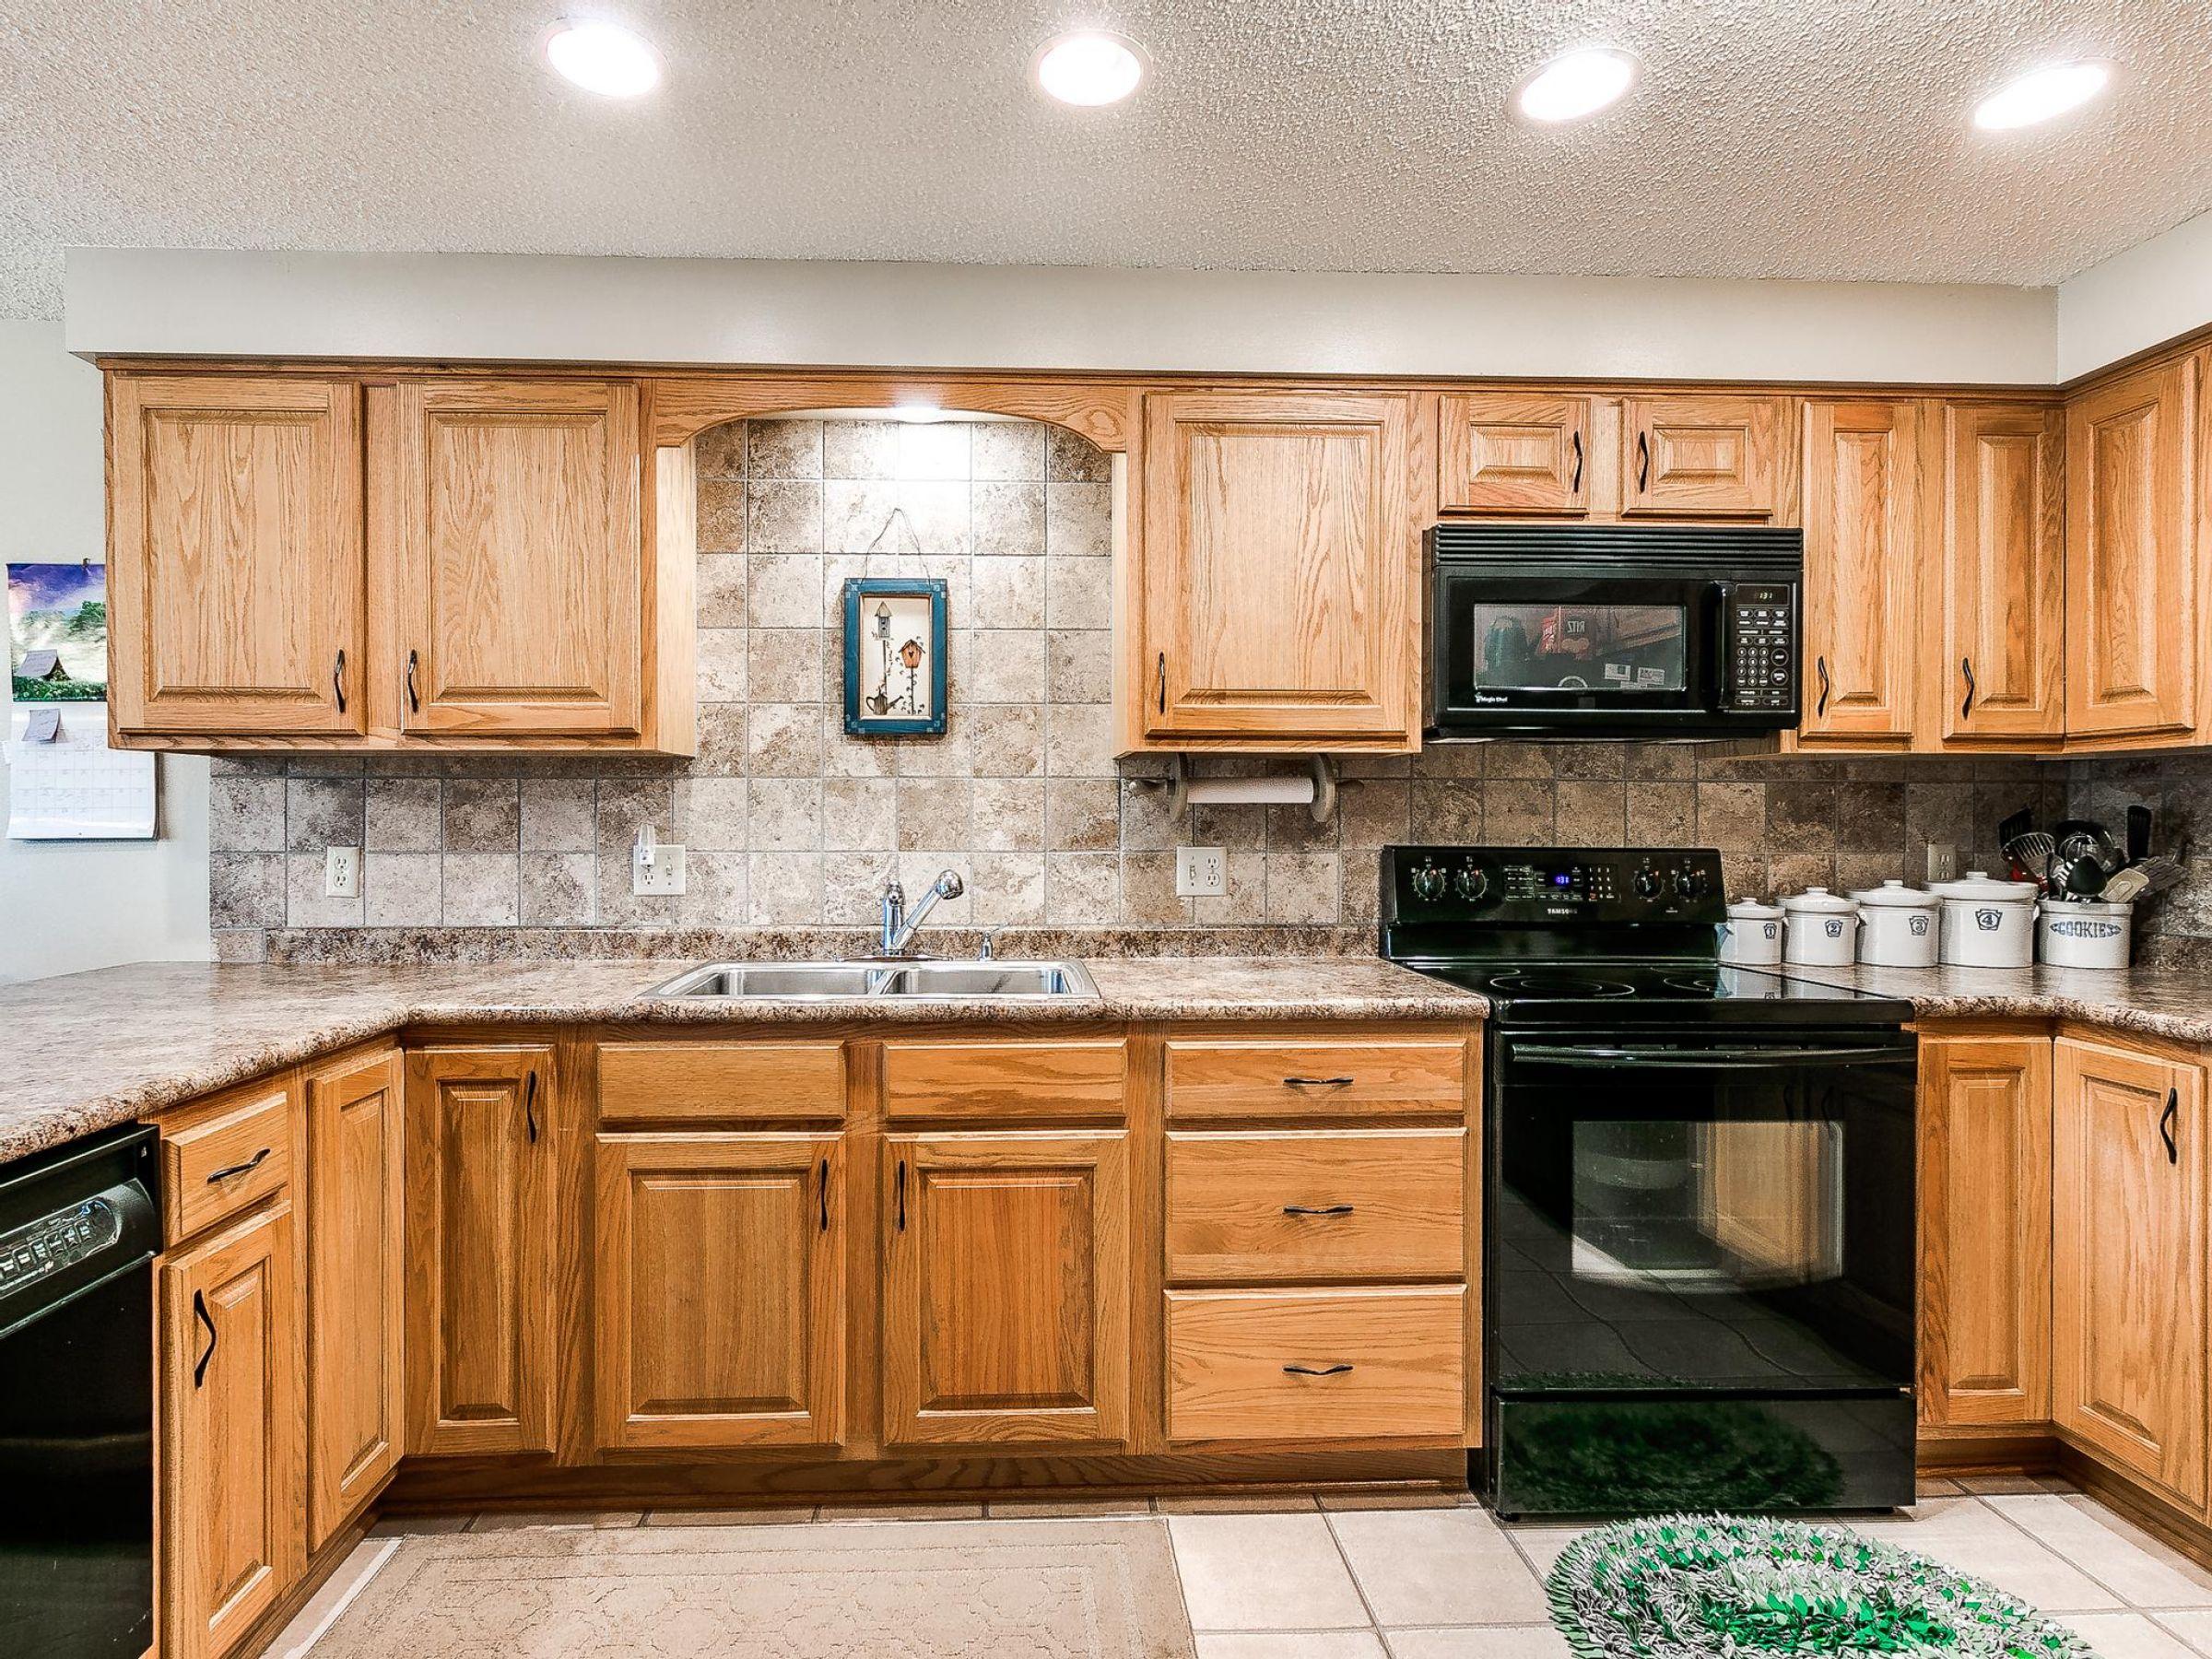 residential-warren-county-iowa-3-acres-listing-number-15593-1-2021-06-18-155158.jpg